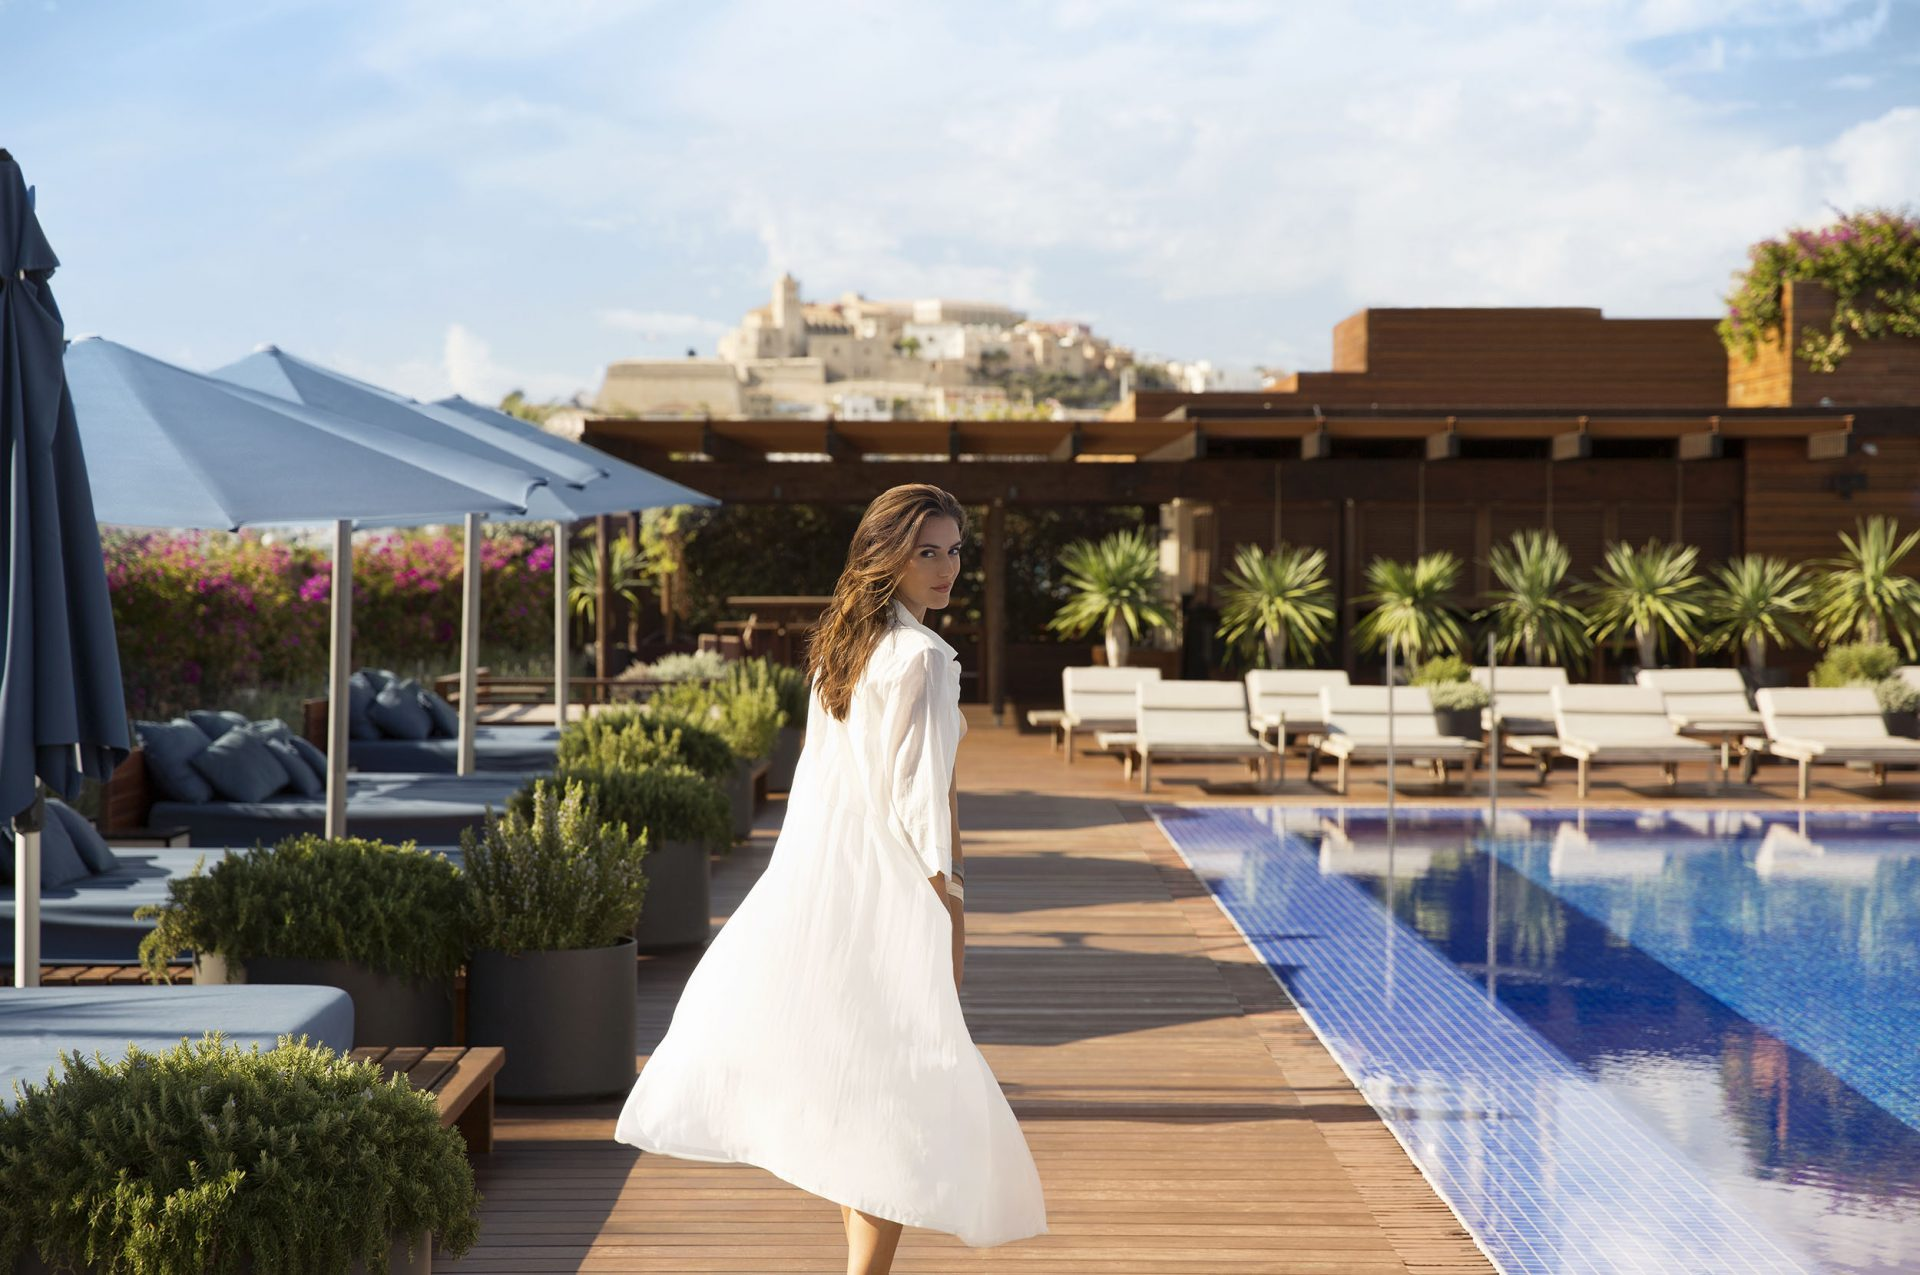 Ibiza Gran Hotel Gallery Pool Up